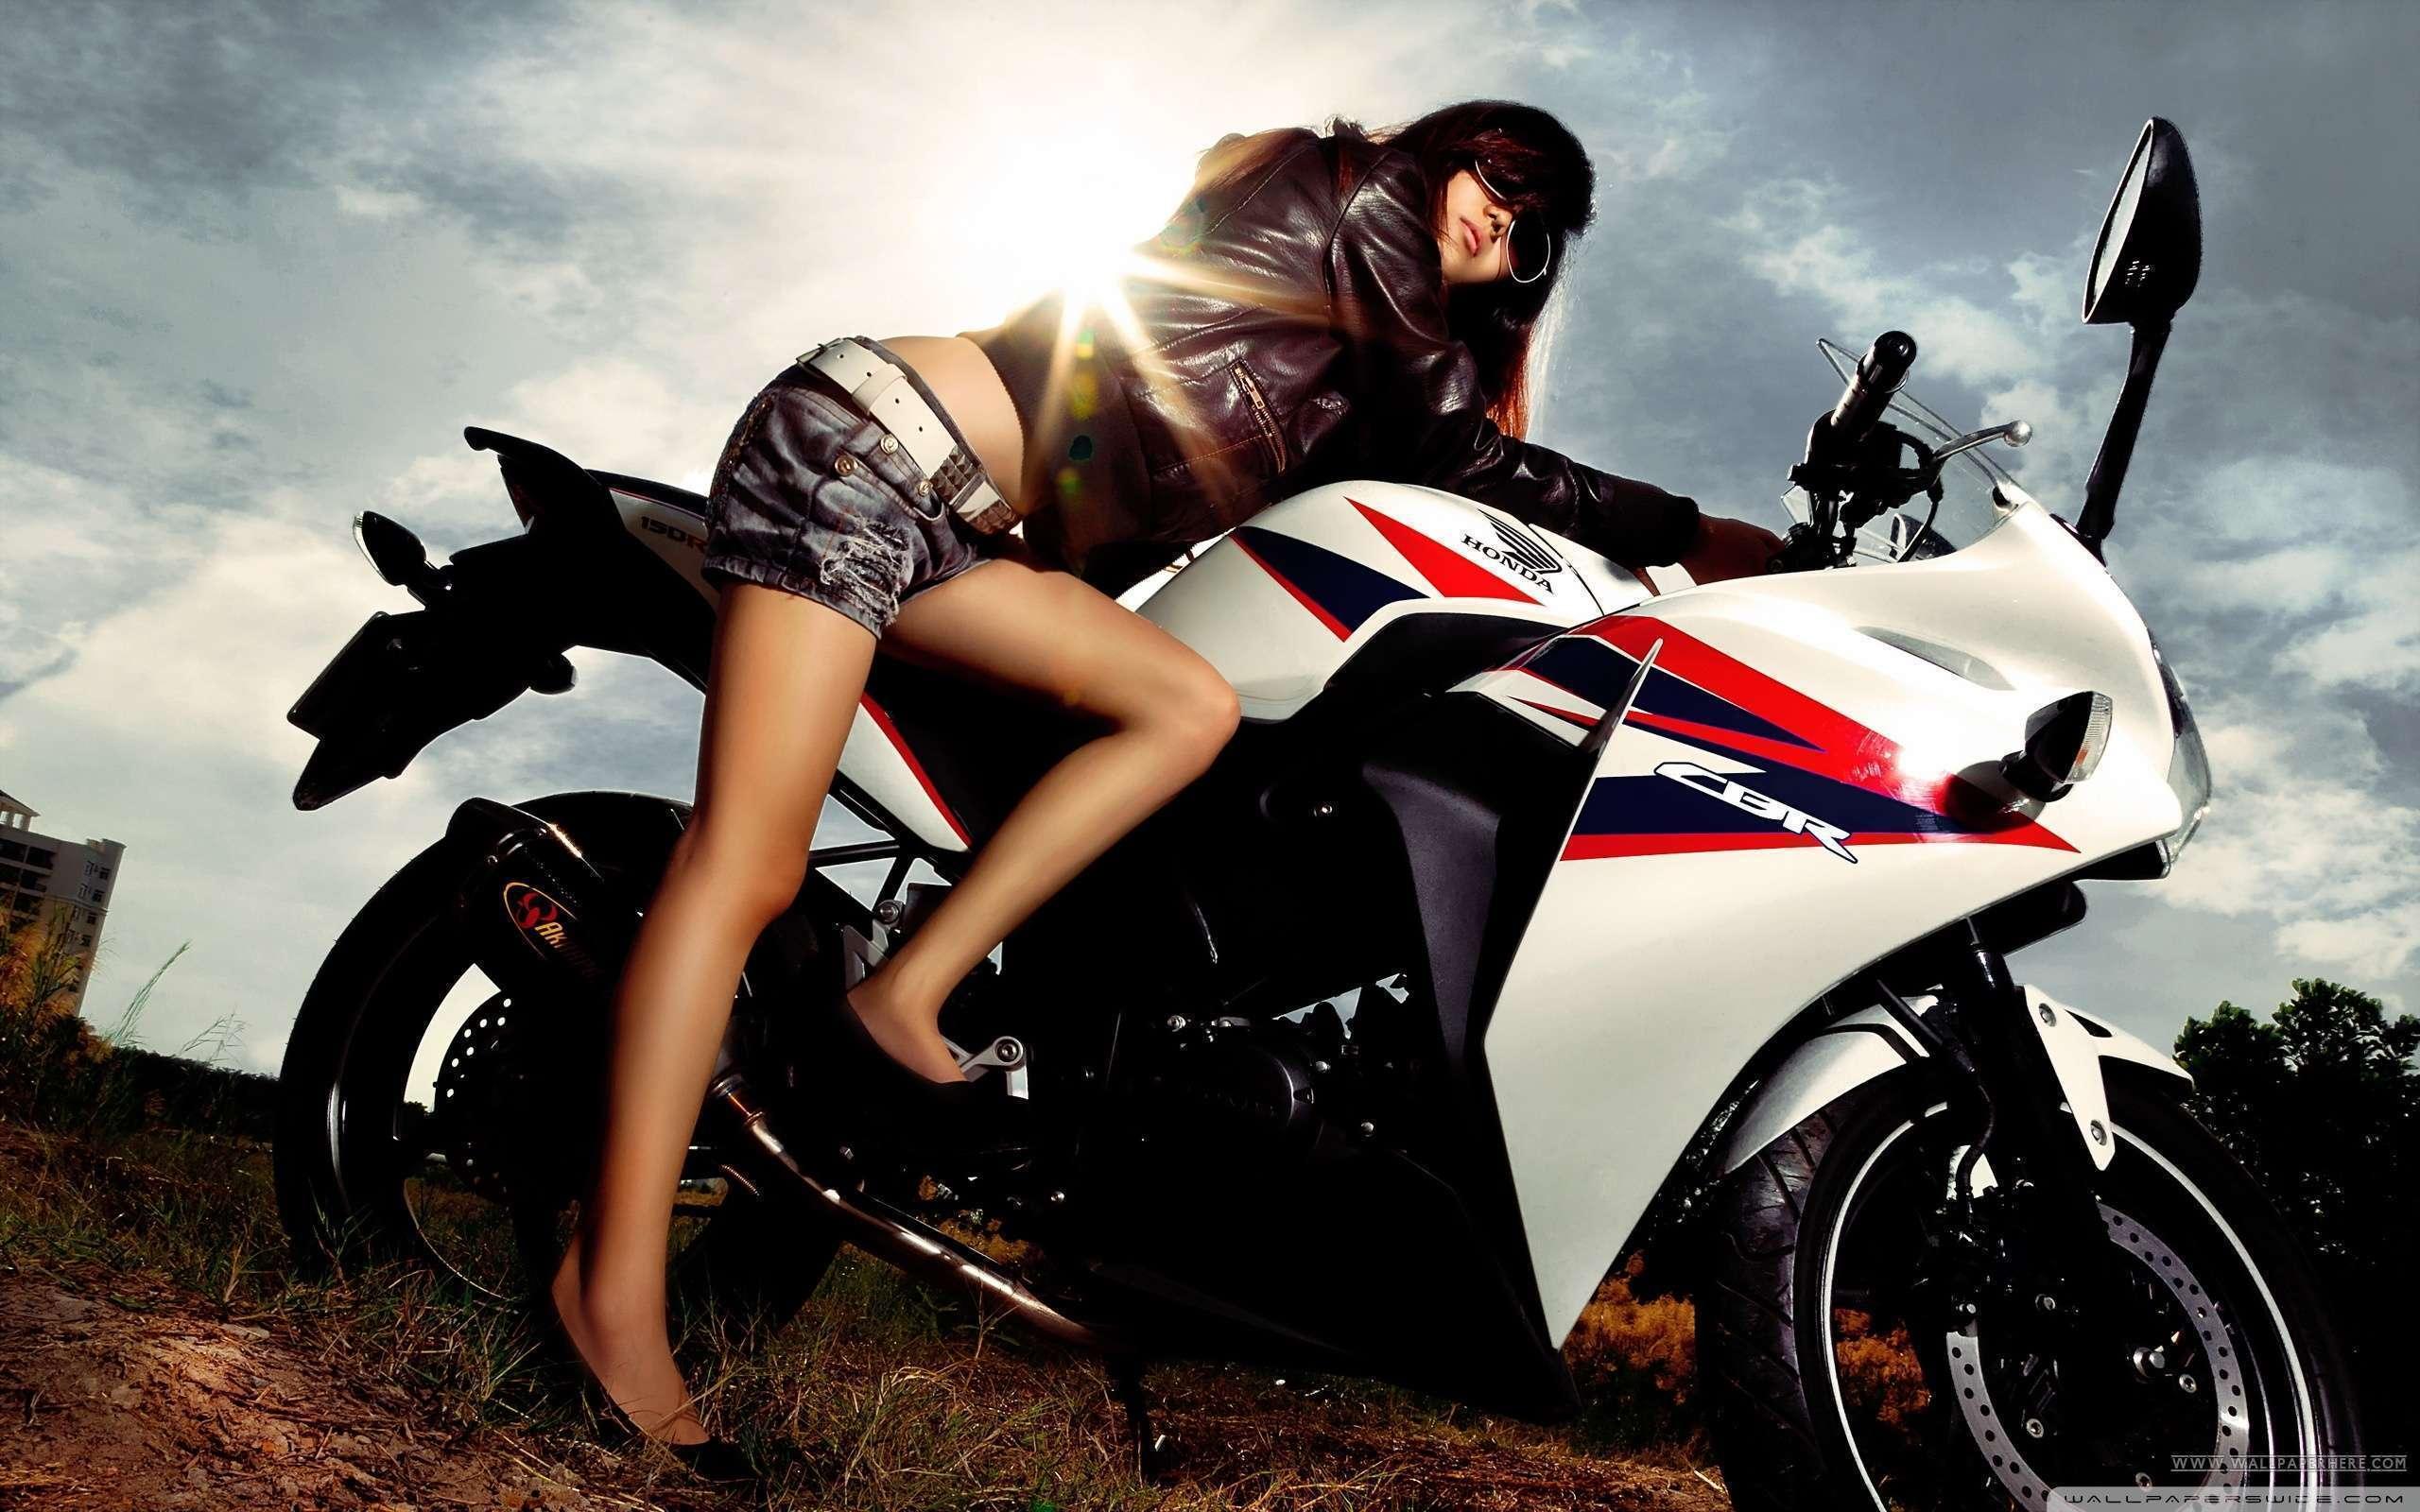 Motorcycle Girl Wallpaper Hd Car Wallpapers 2560x1600